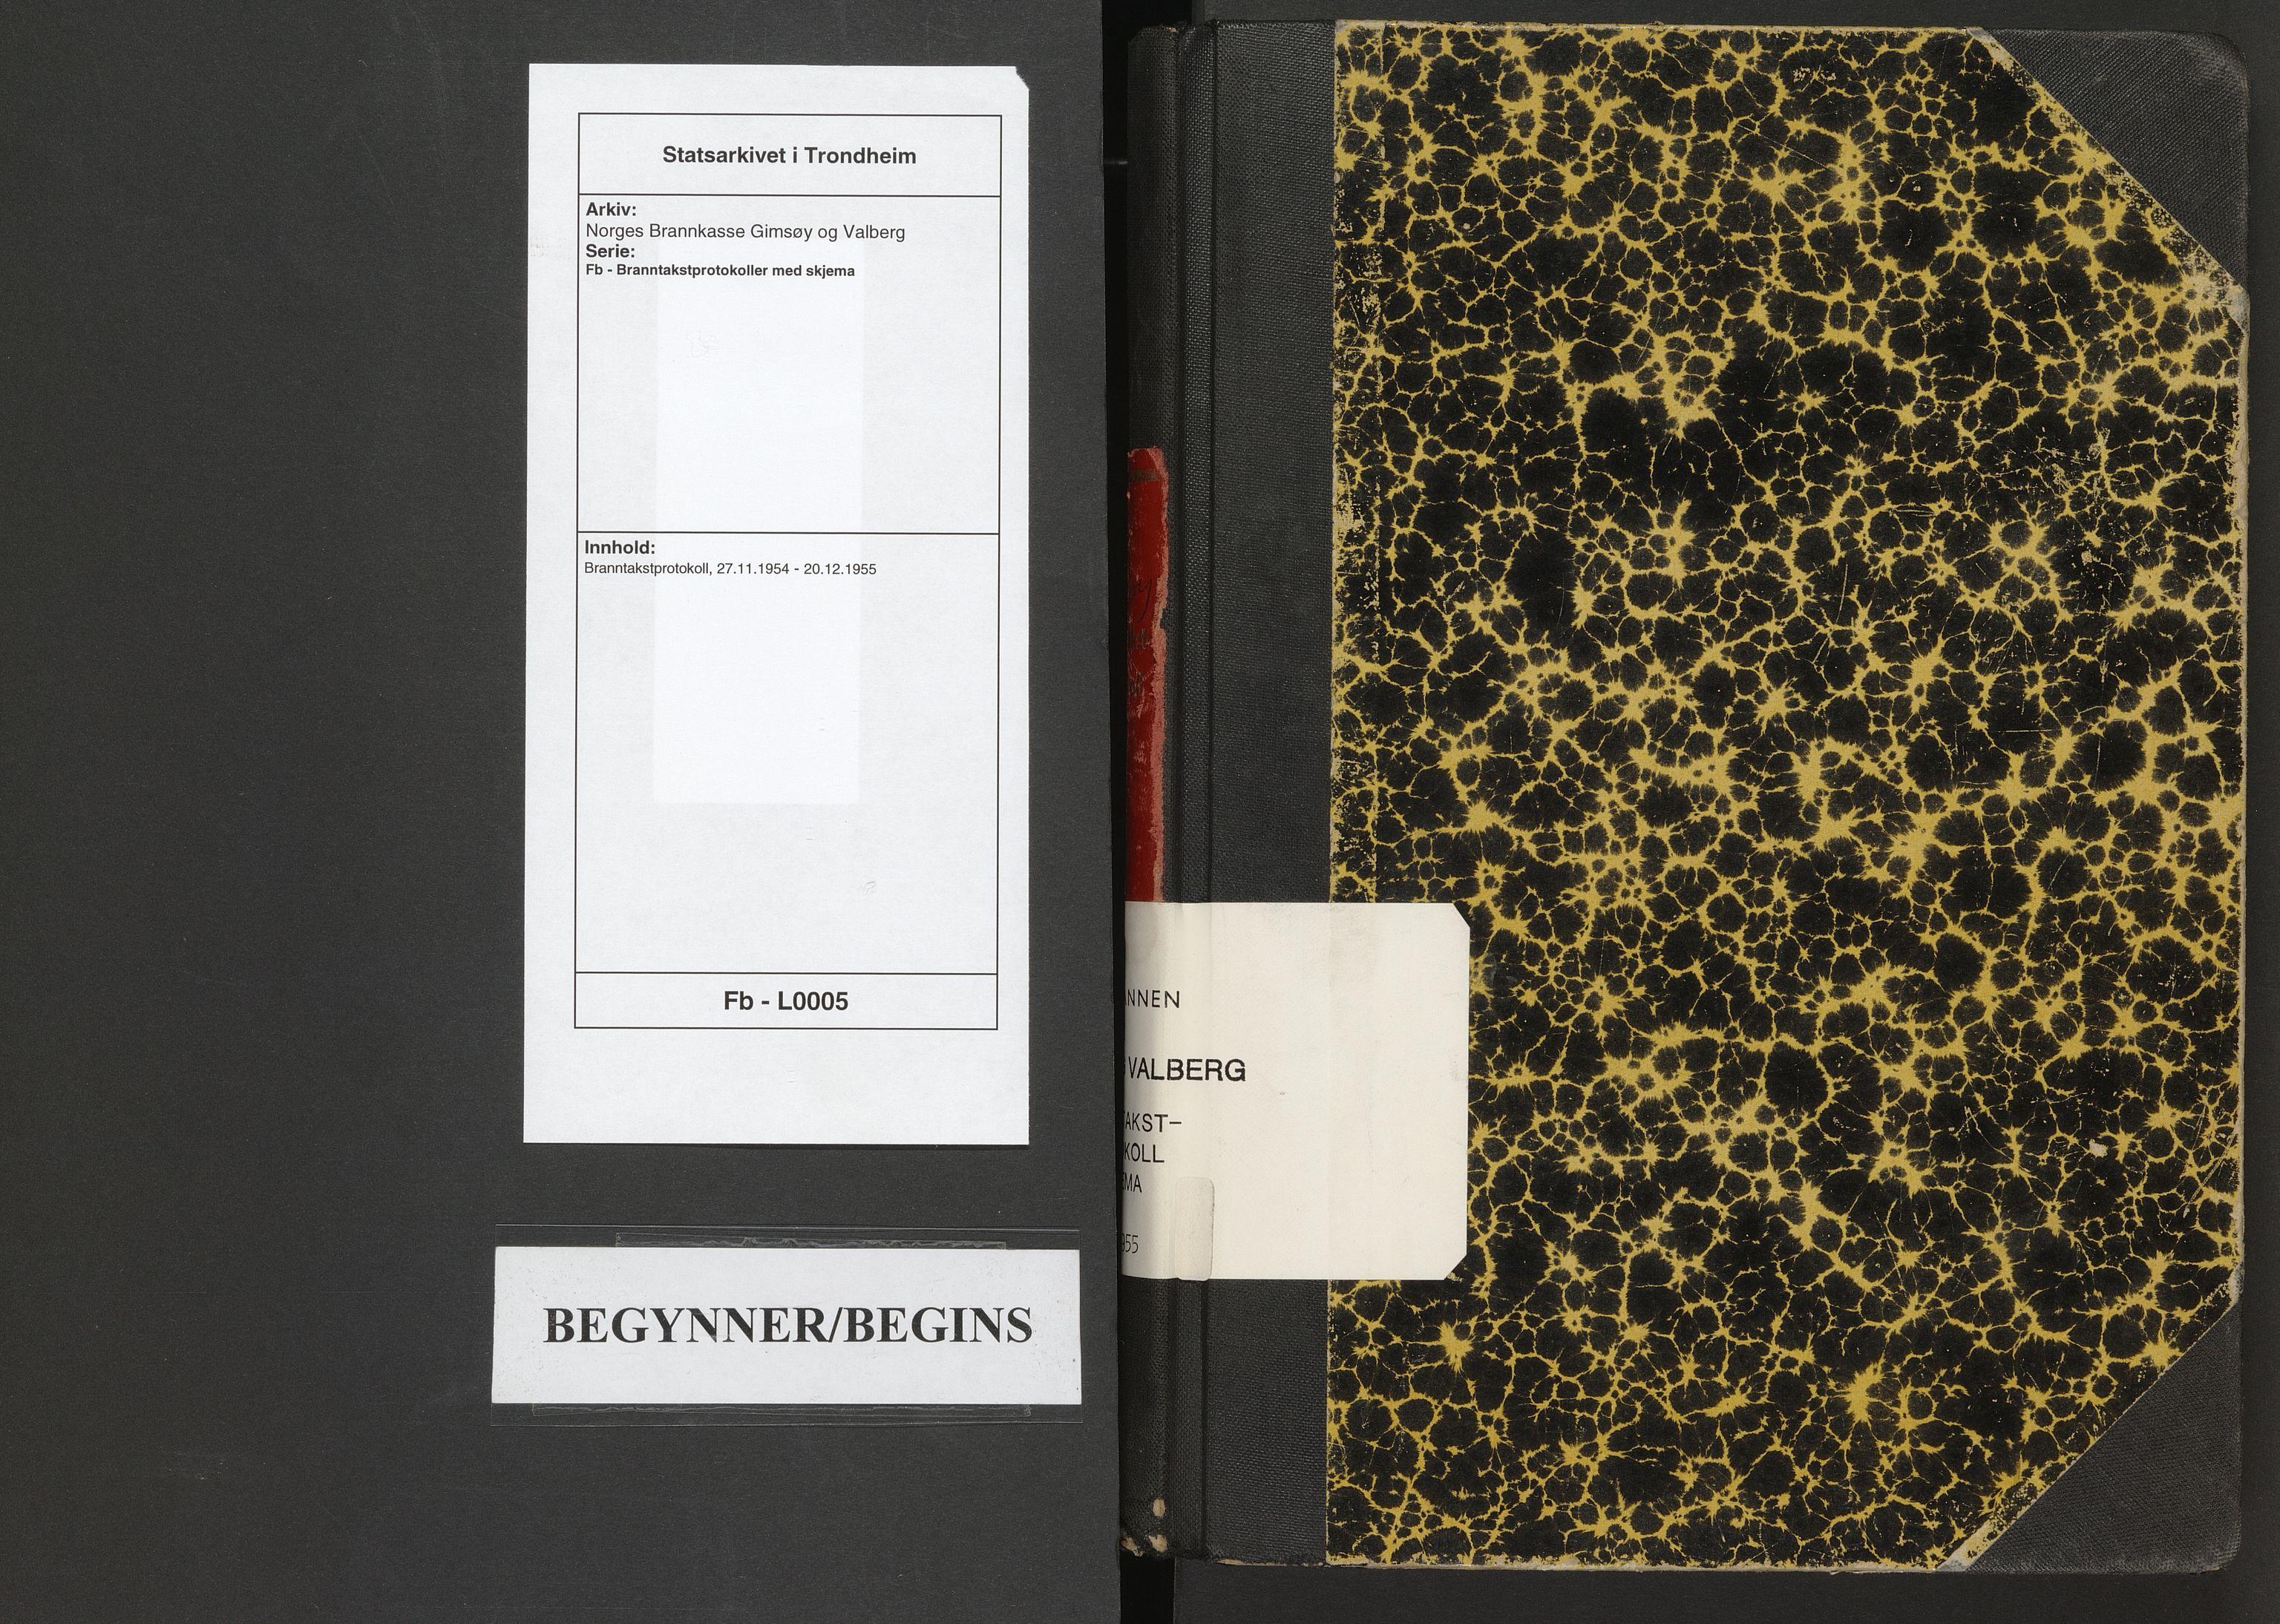 SAT, Norges Brannkasse Gimsøy og Valberg, Fb/L0005: Branntakstprotokoll, 1954-1955